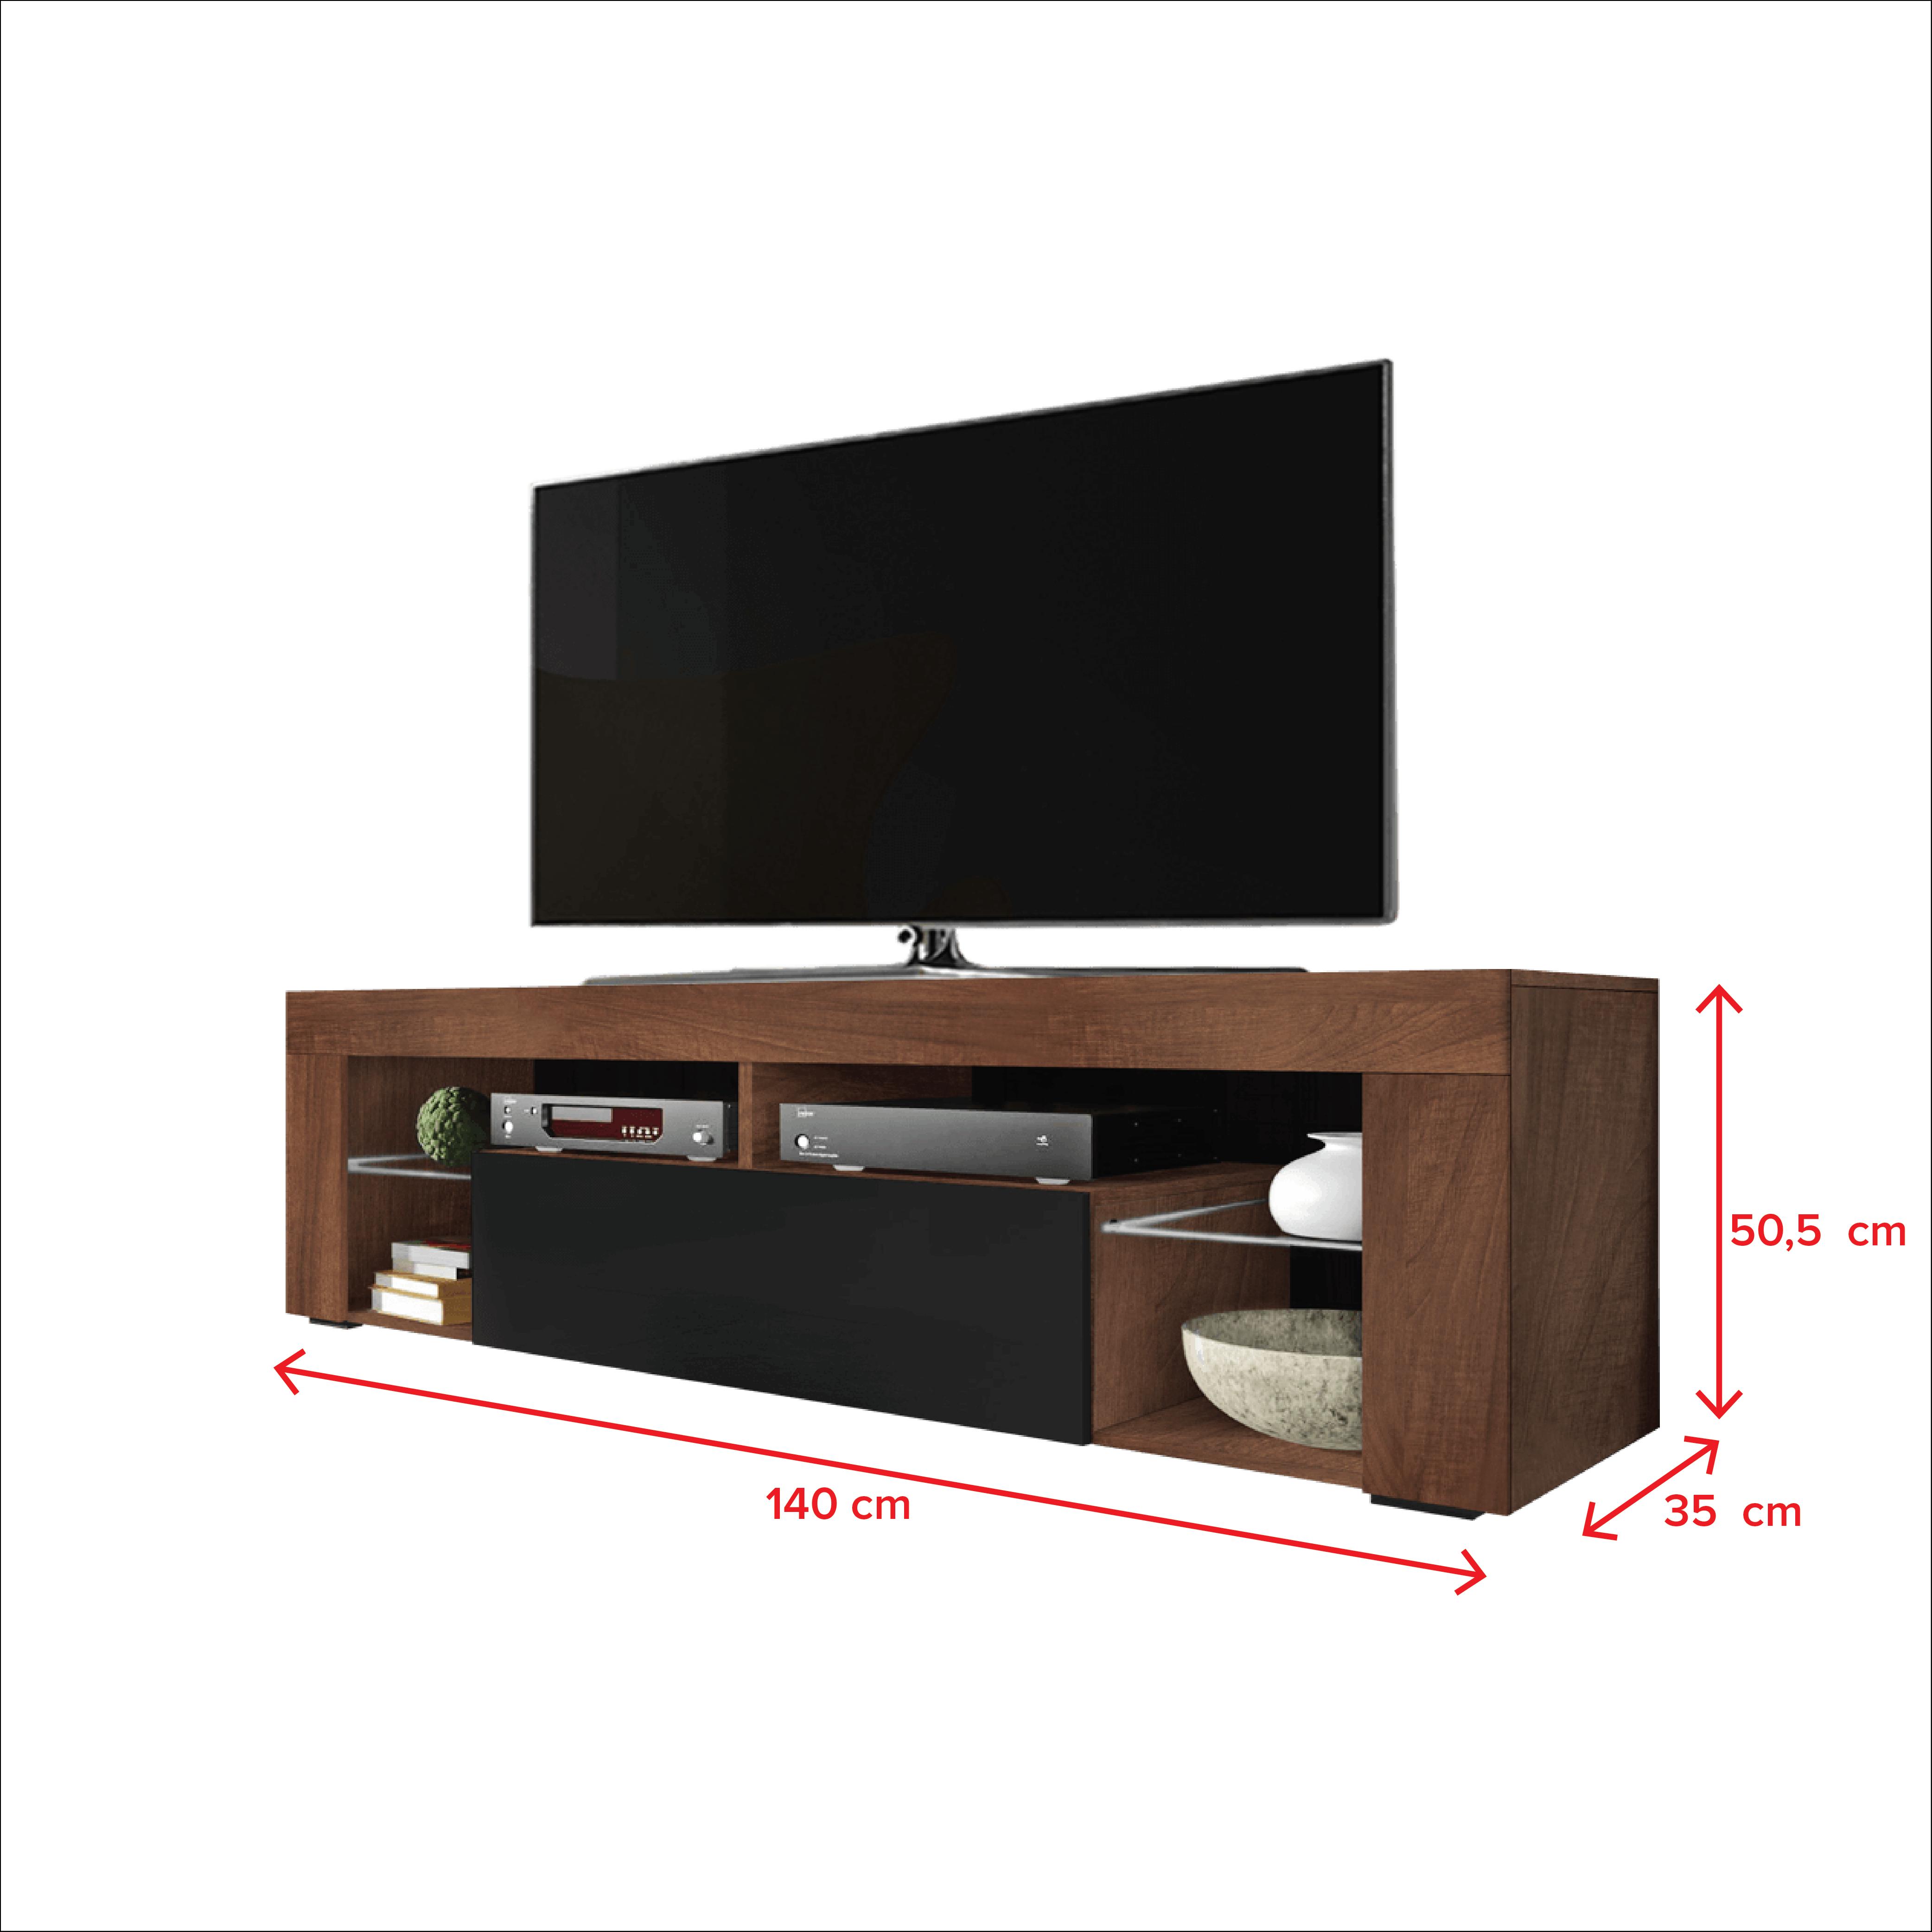 Meuble Tv Grande Taille meuble tv / banc tv - bianko - 140 cm - chêne caravaggio